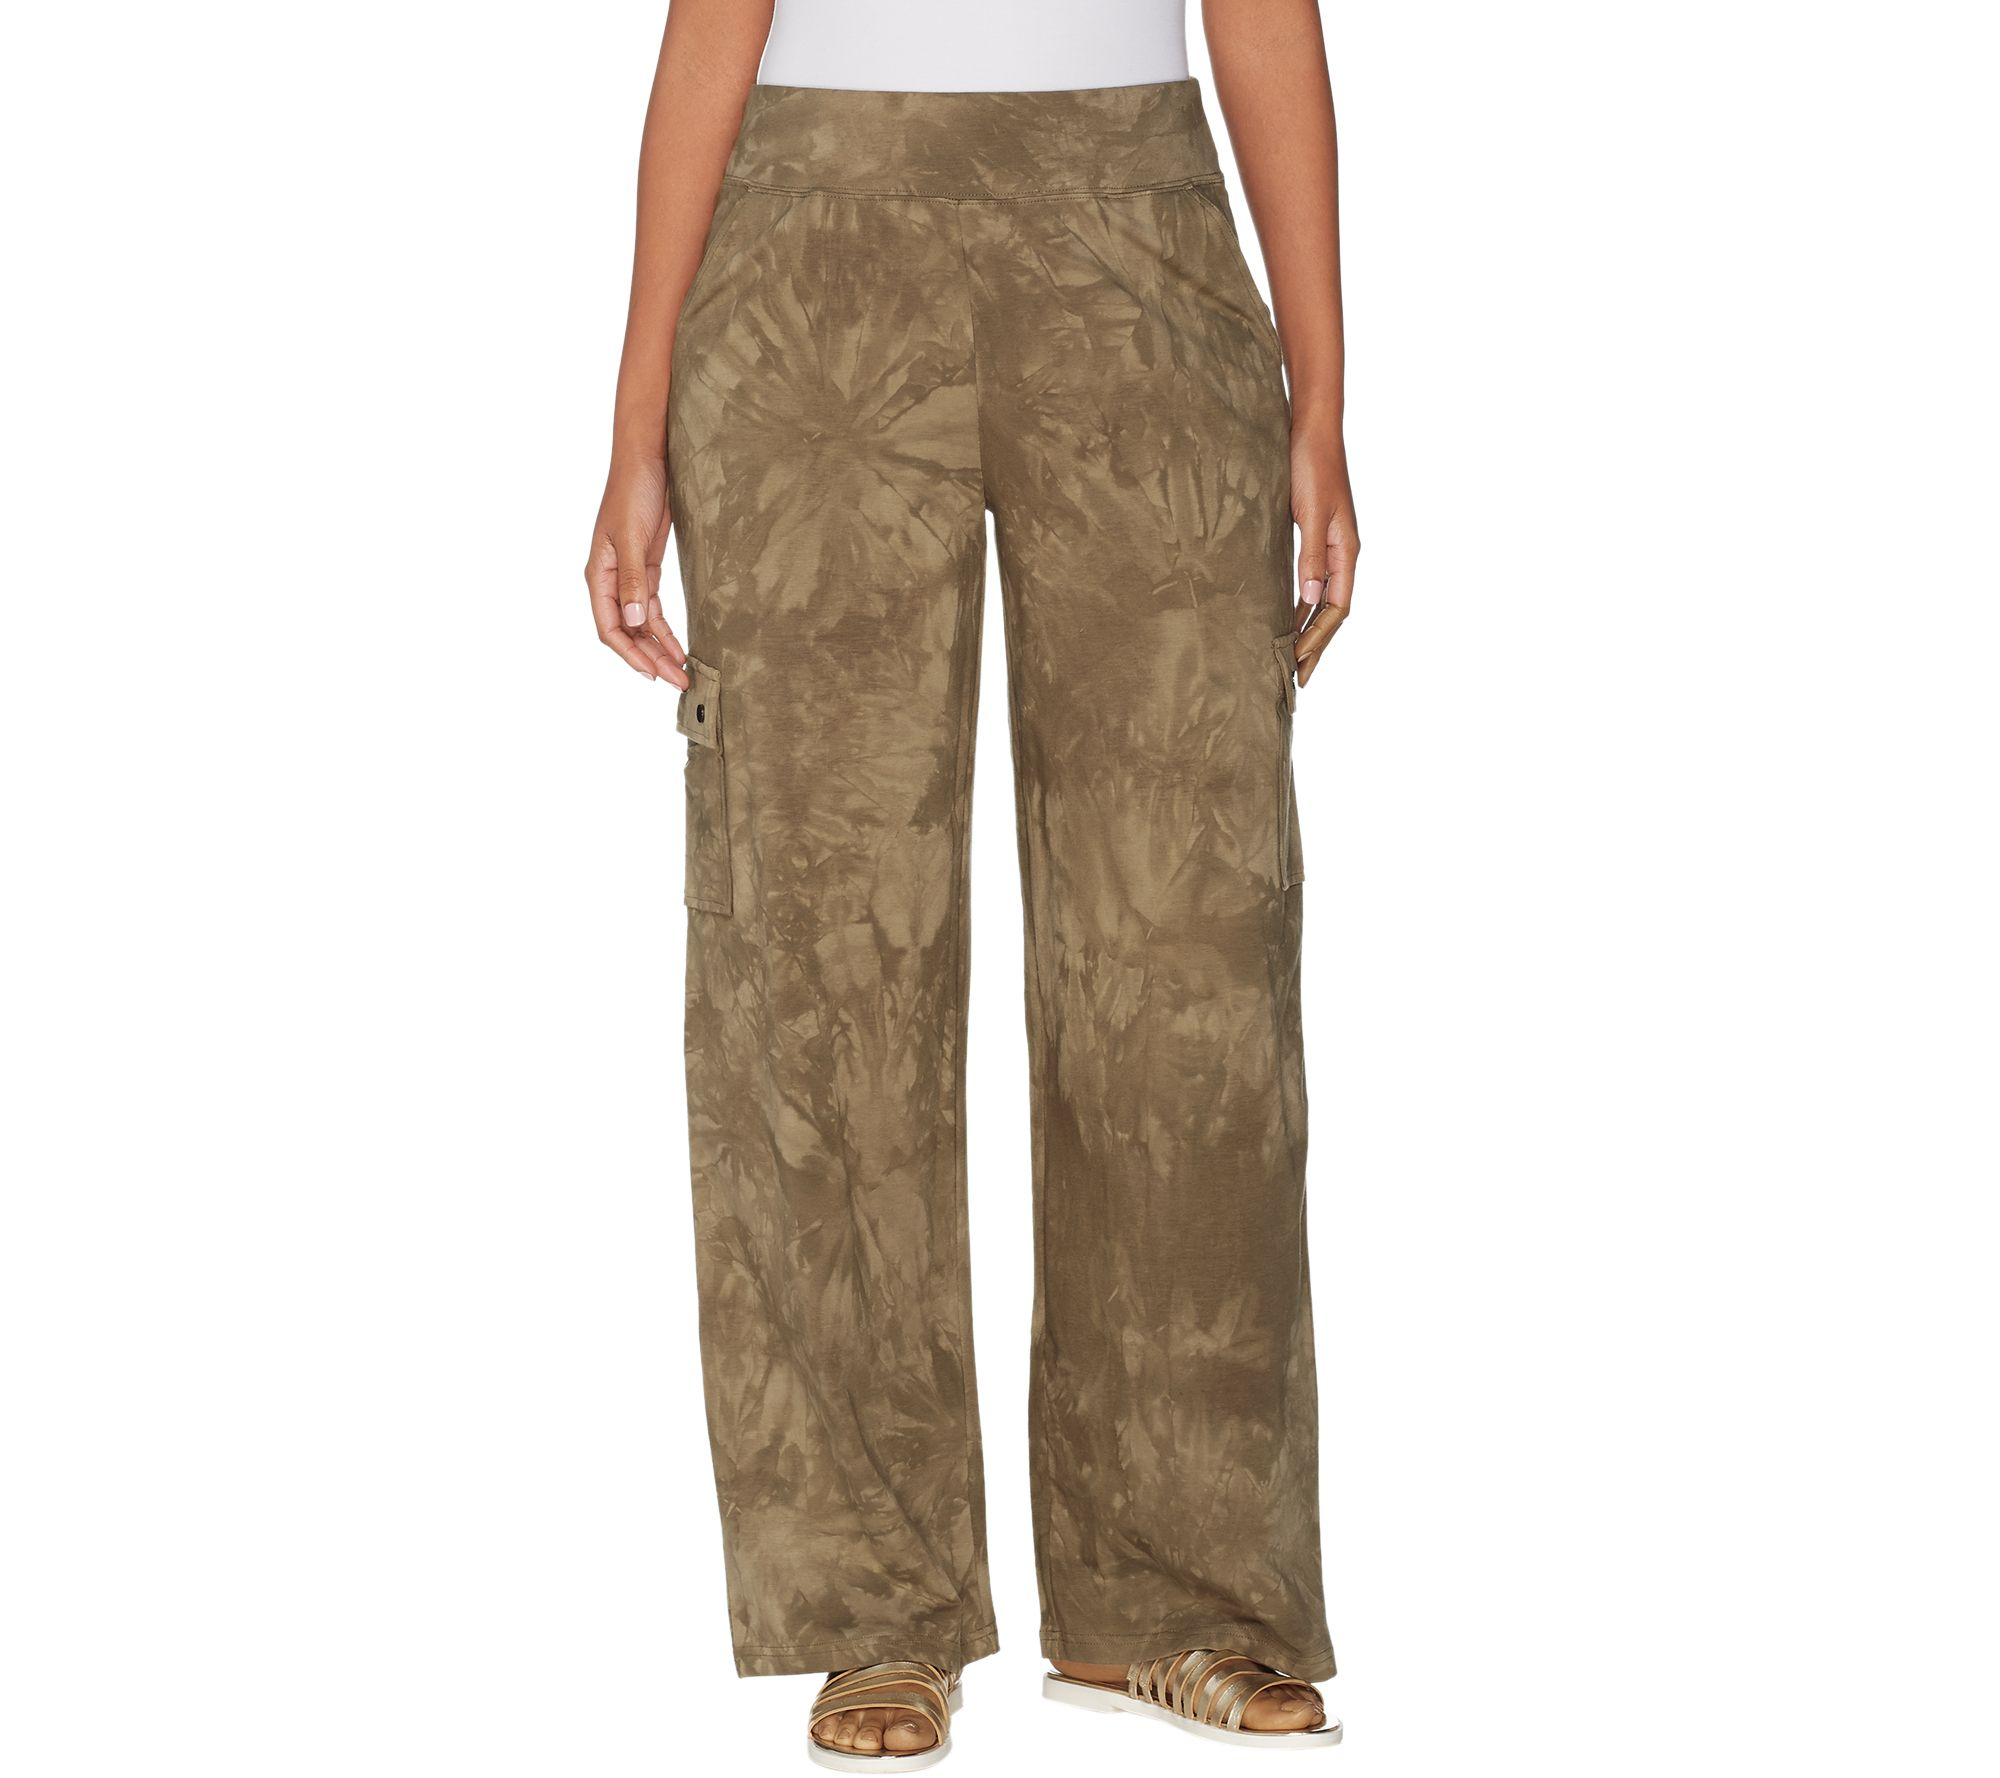 713234f4fc Belle By Kim Gravel TripleLuxe Knit Wide Leg Cargo Pant — QVC.com